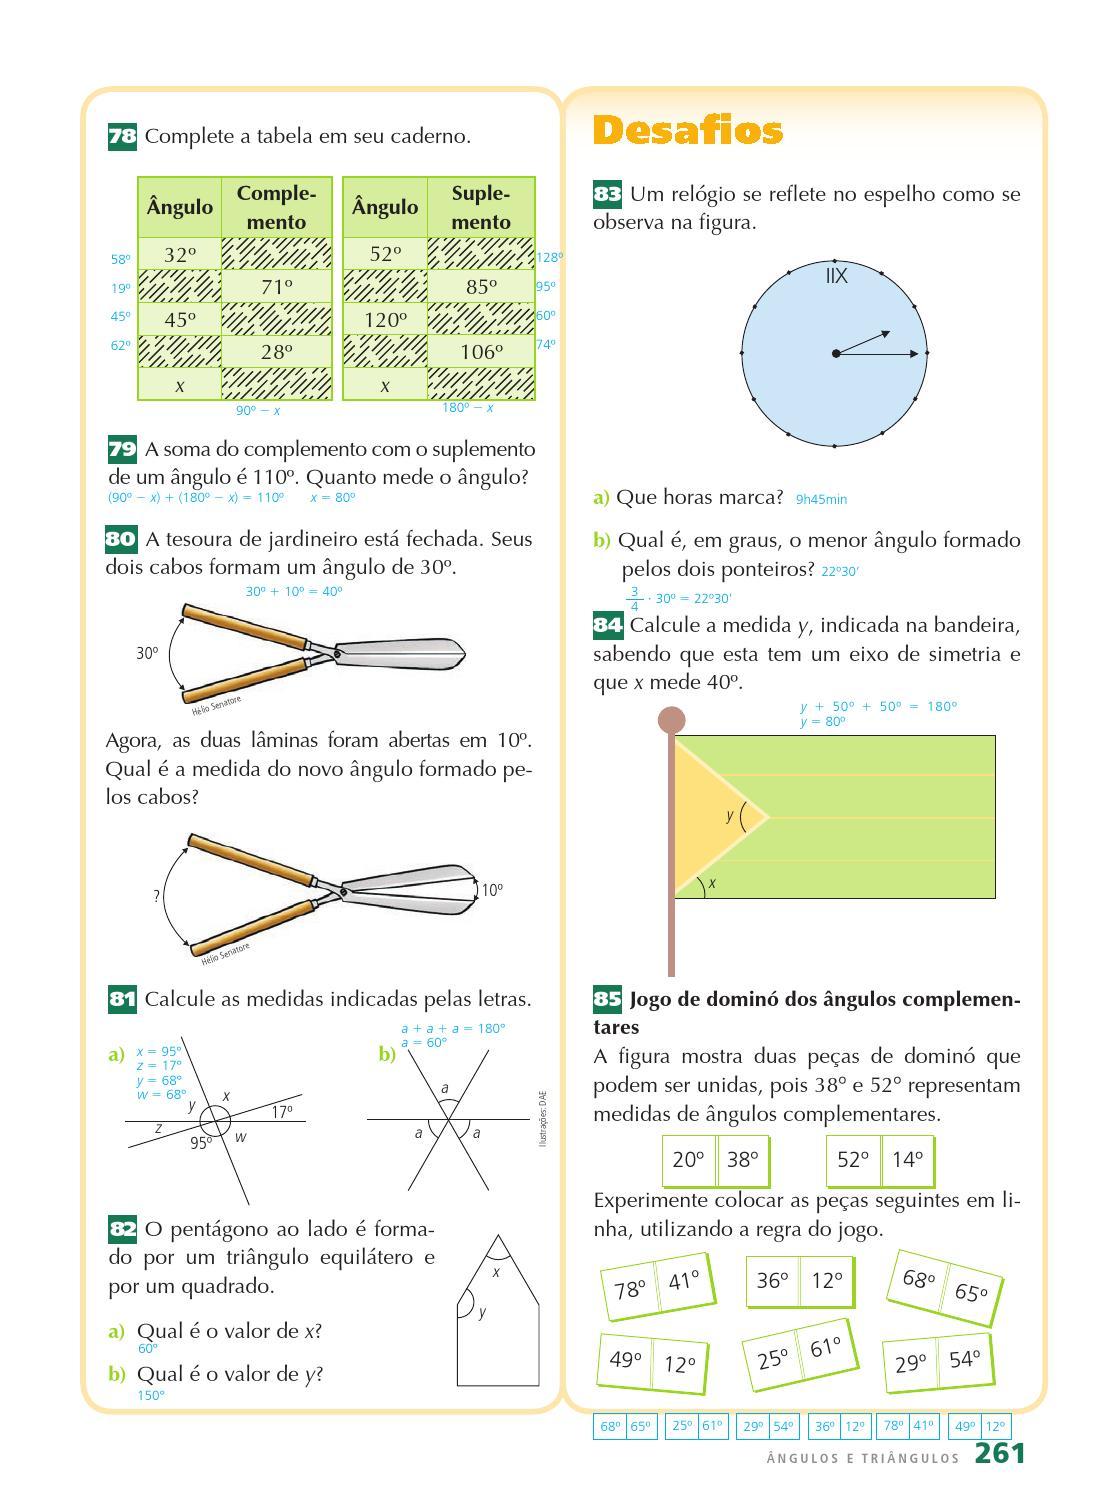 Praticando matematica 7ano by ronaldo.cardoso - issuu dc9c1fe5f2ff9